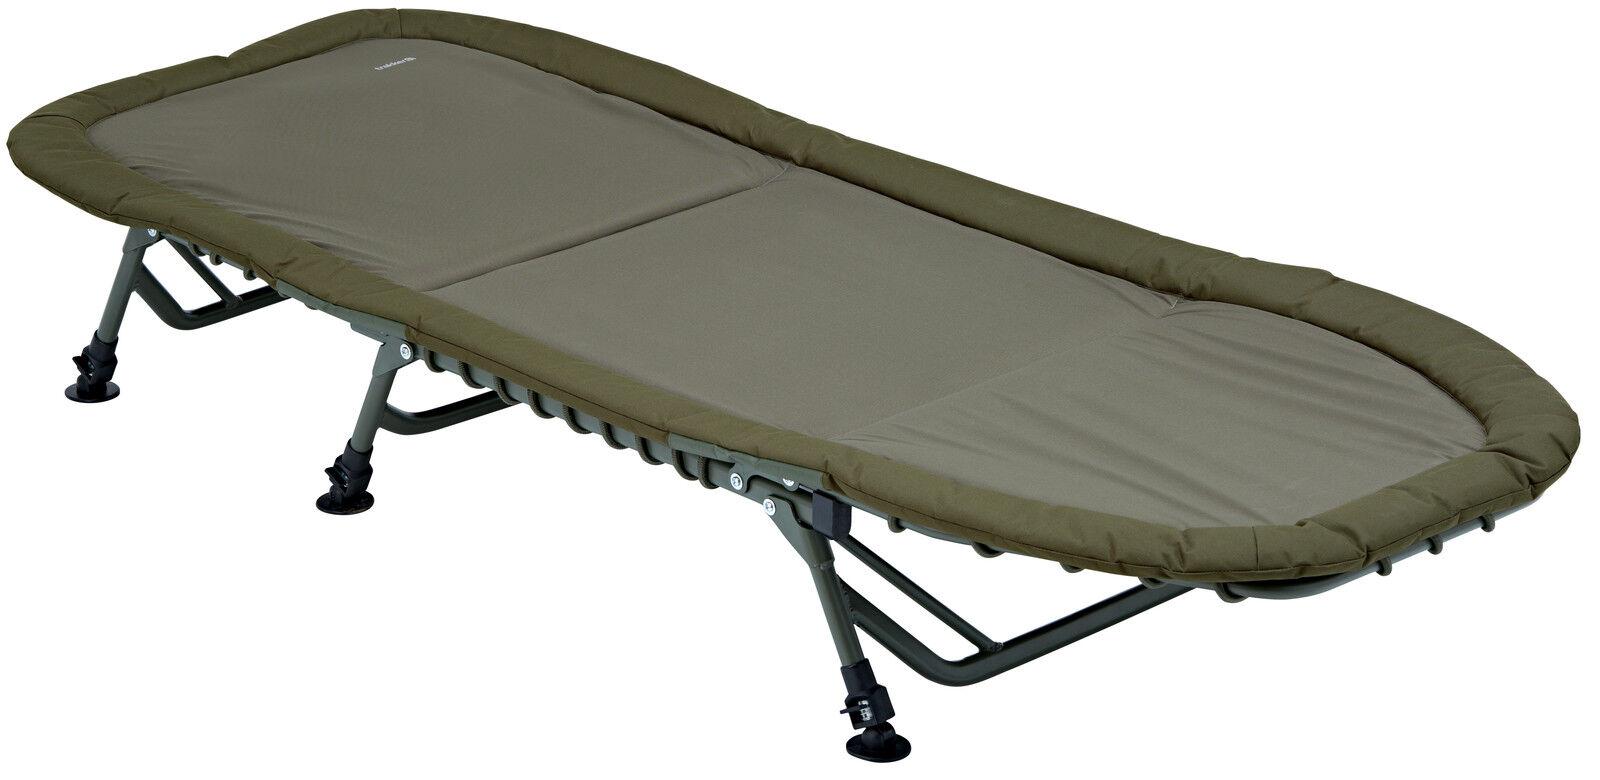 Trakker RLX Flat-6 Superlight Bedchair BED FREE TRAKKER PILLOW FREE POSTAGE